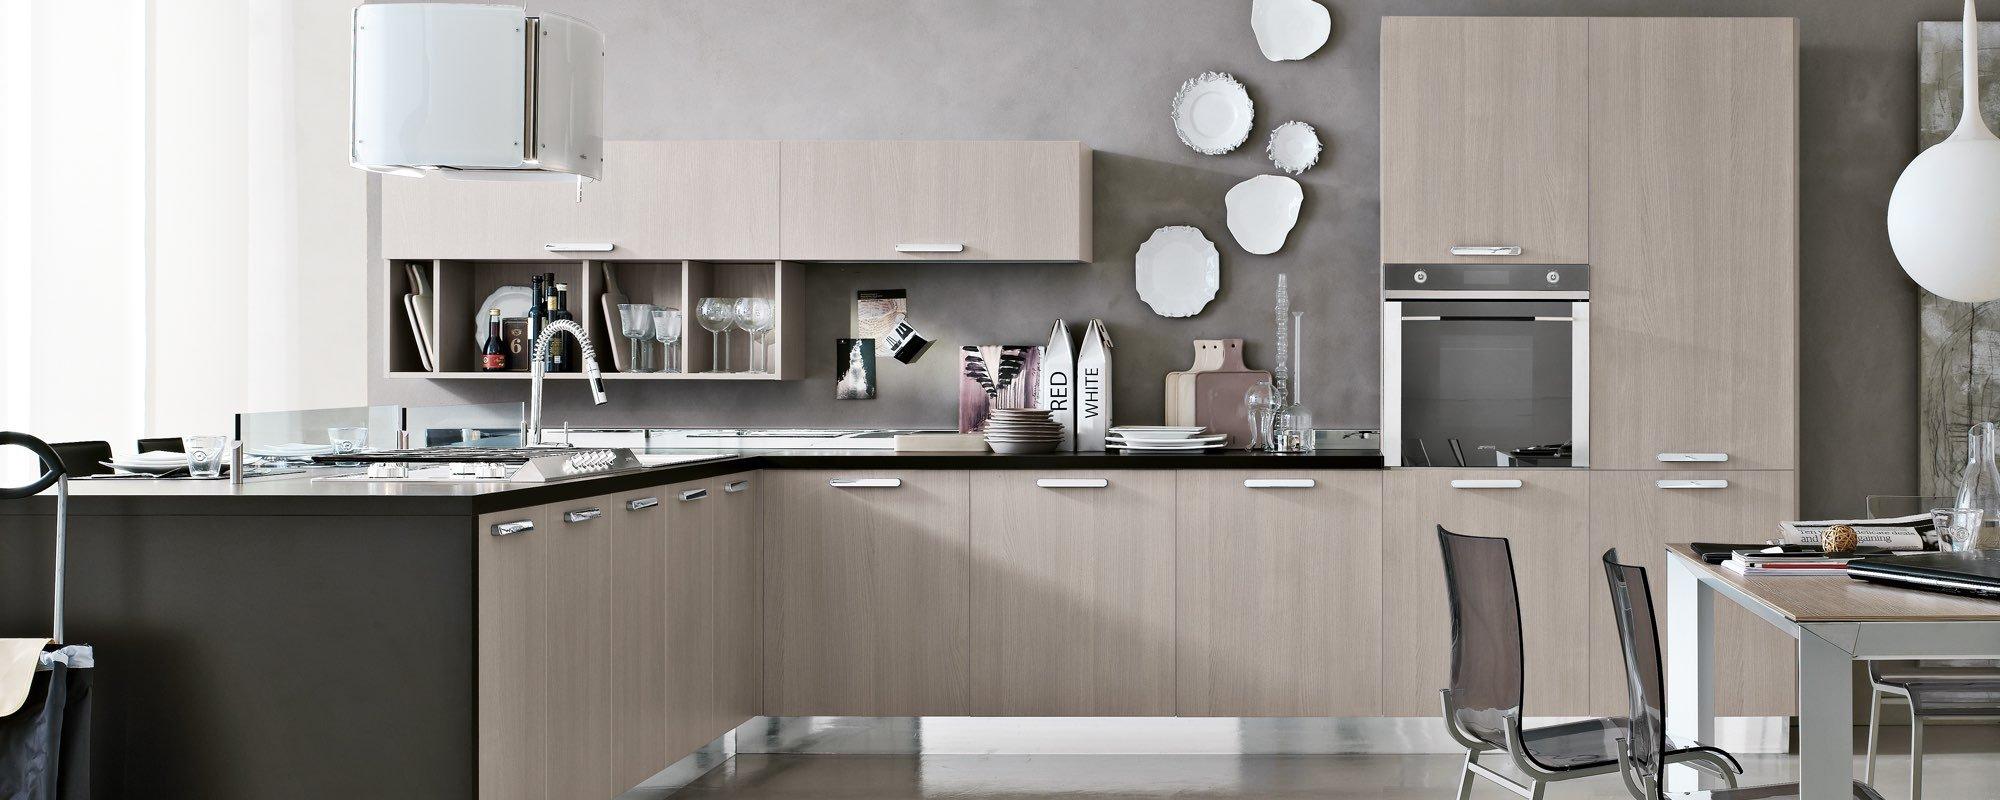 cucina moderna in legno - Milly